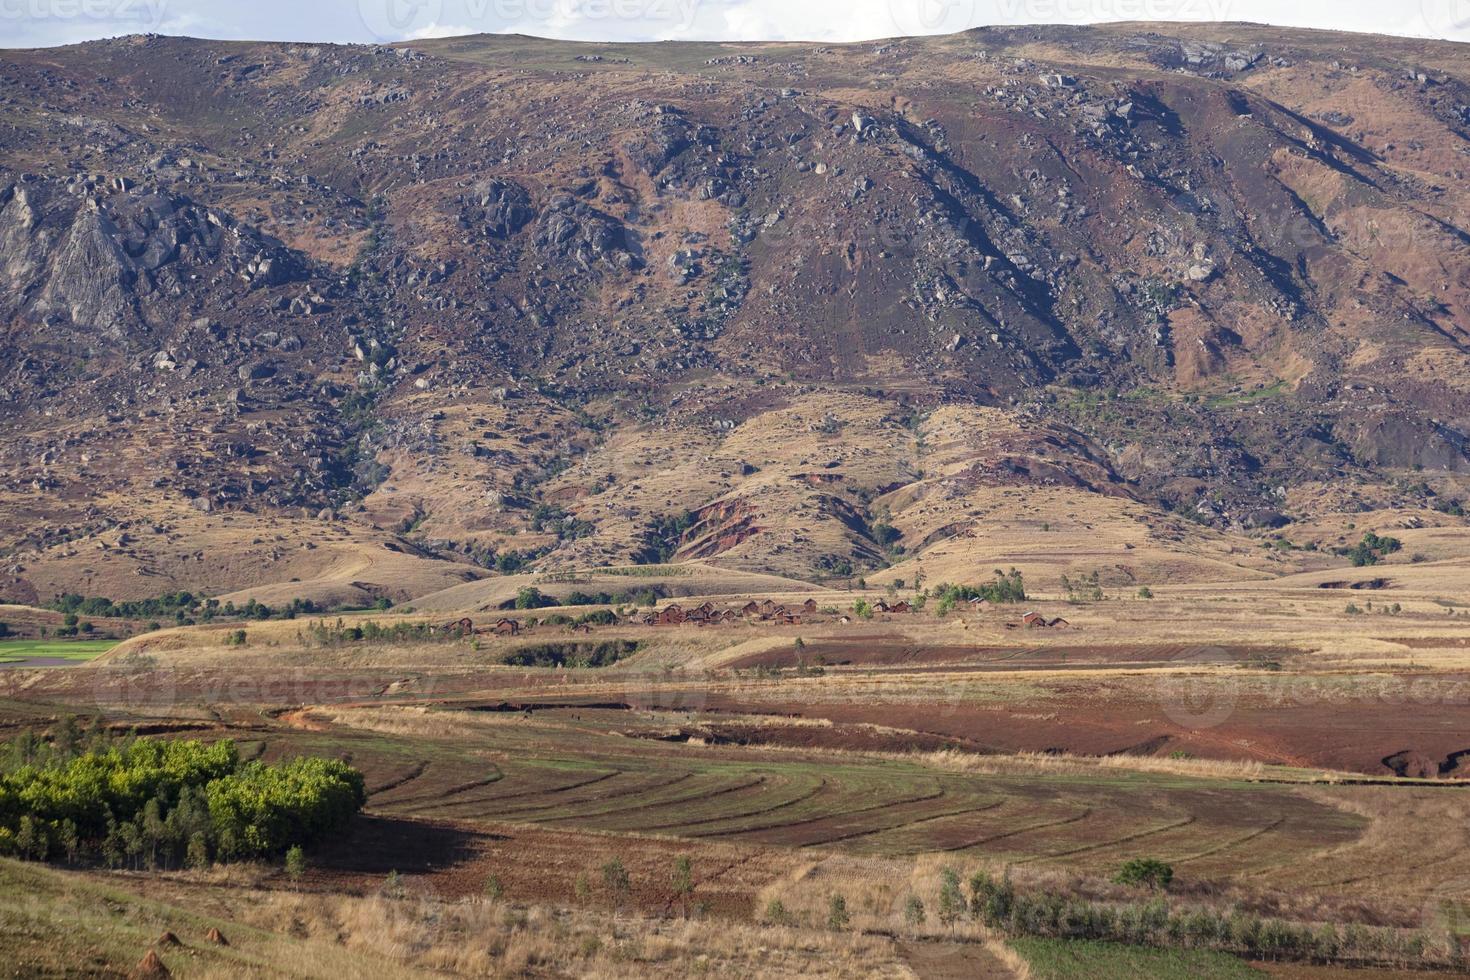 villaggio annidato sotto una montagna, madagascar foto